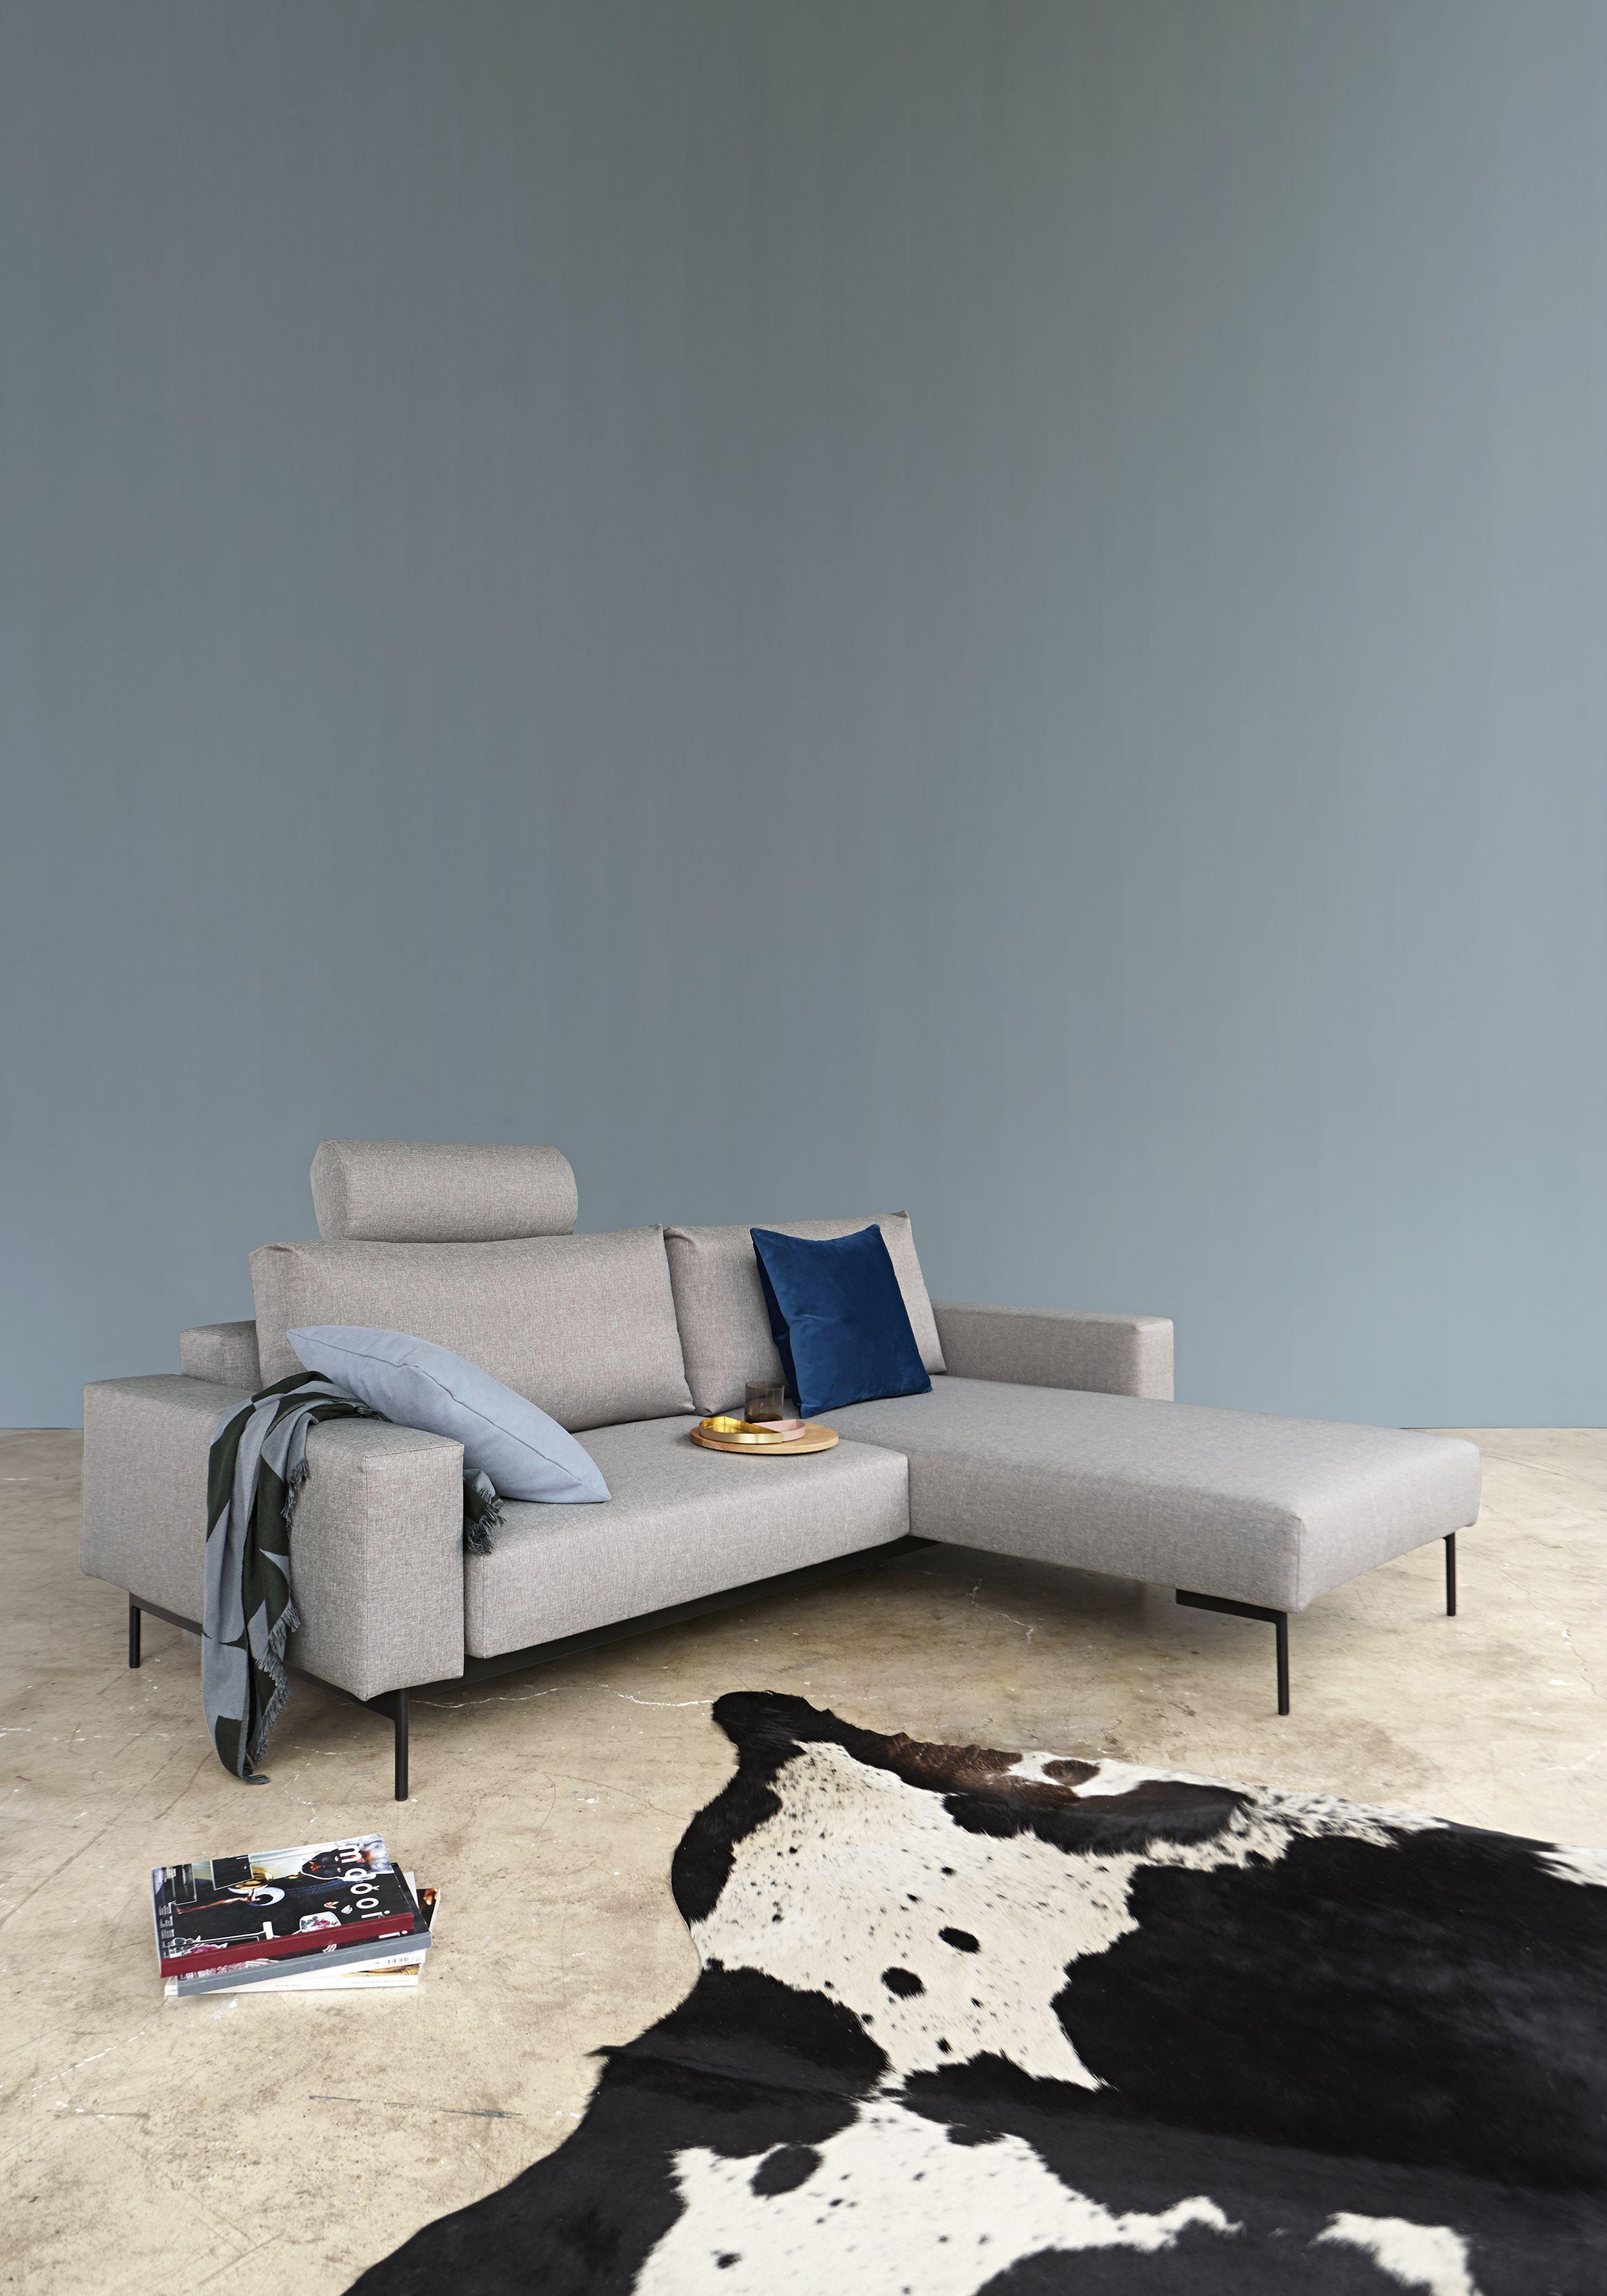 Bragi 140 X 200 Cm Schlafsofa Scandinavian Design Ecksofas Sofa Bett Sofa